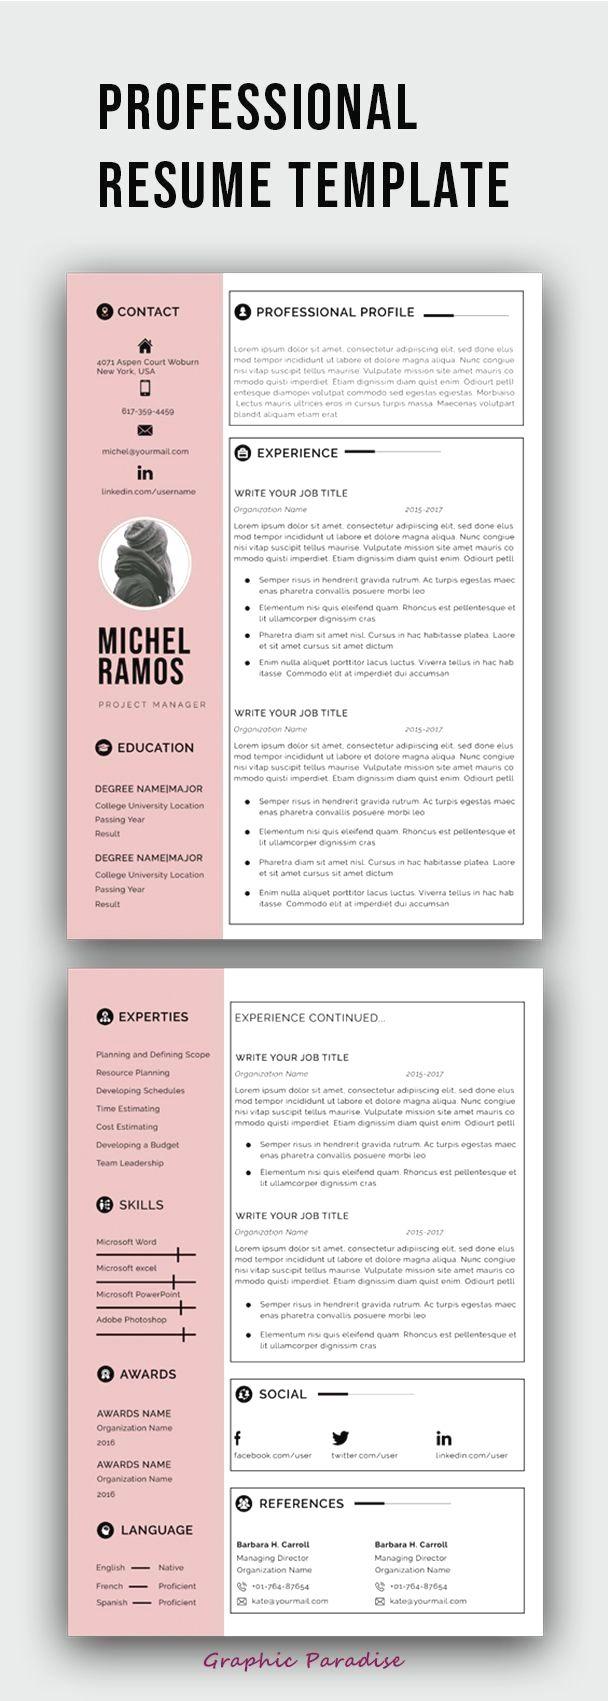 Epingle Sur Resume Design